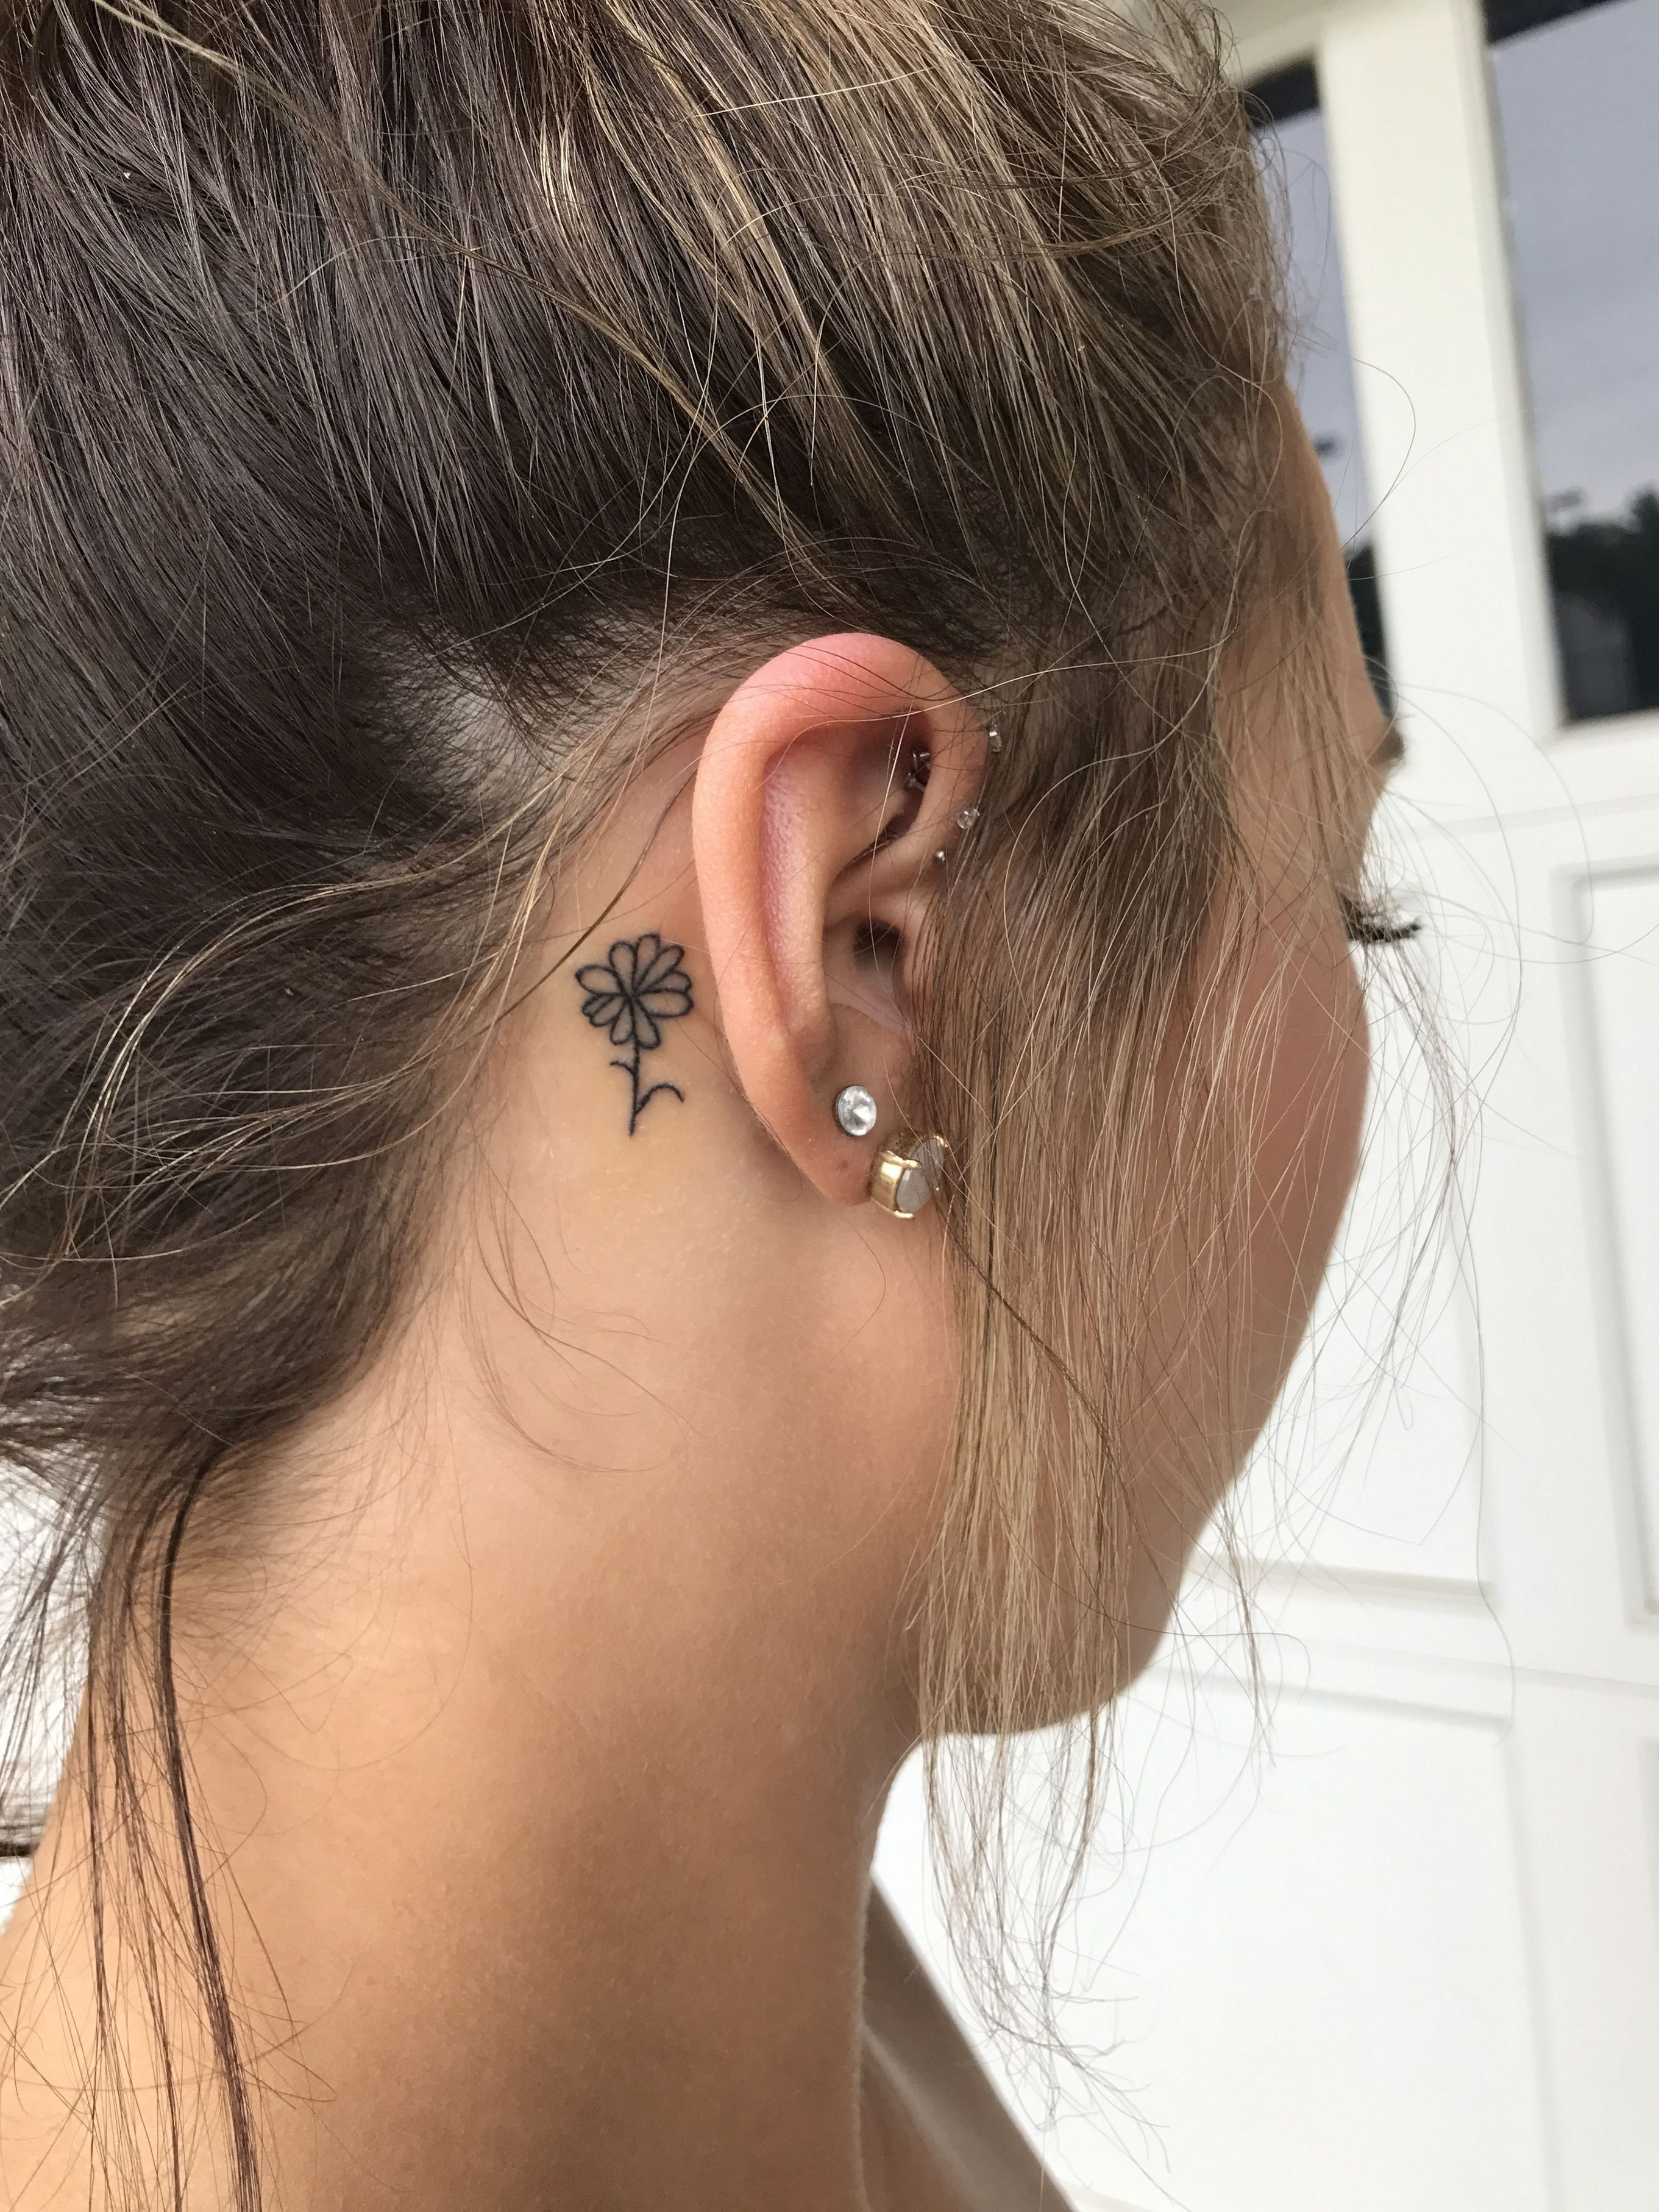 Piercing names body   inspiration for cute simple mini flower tattoo ideas  Tattoos